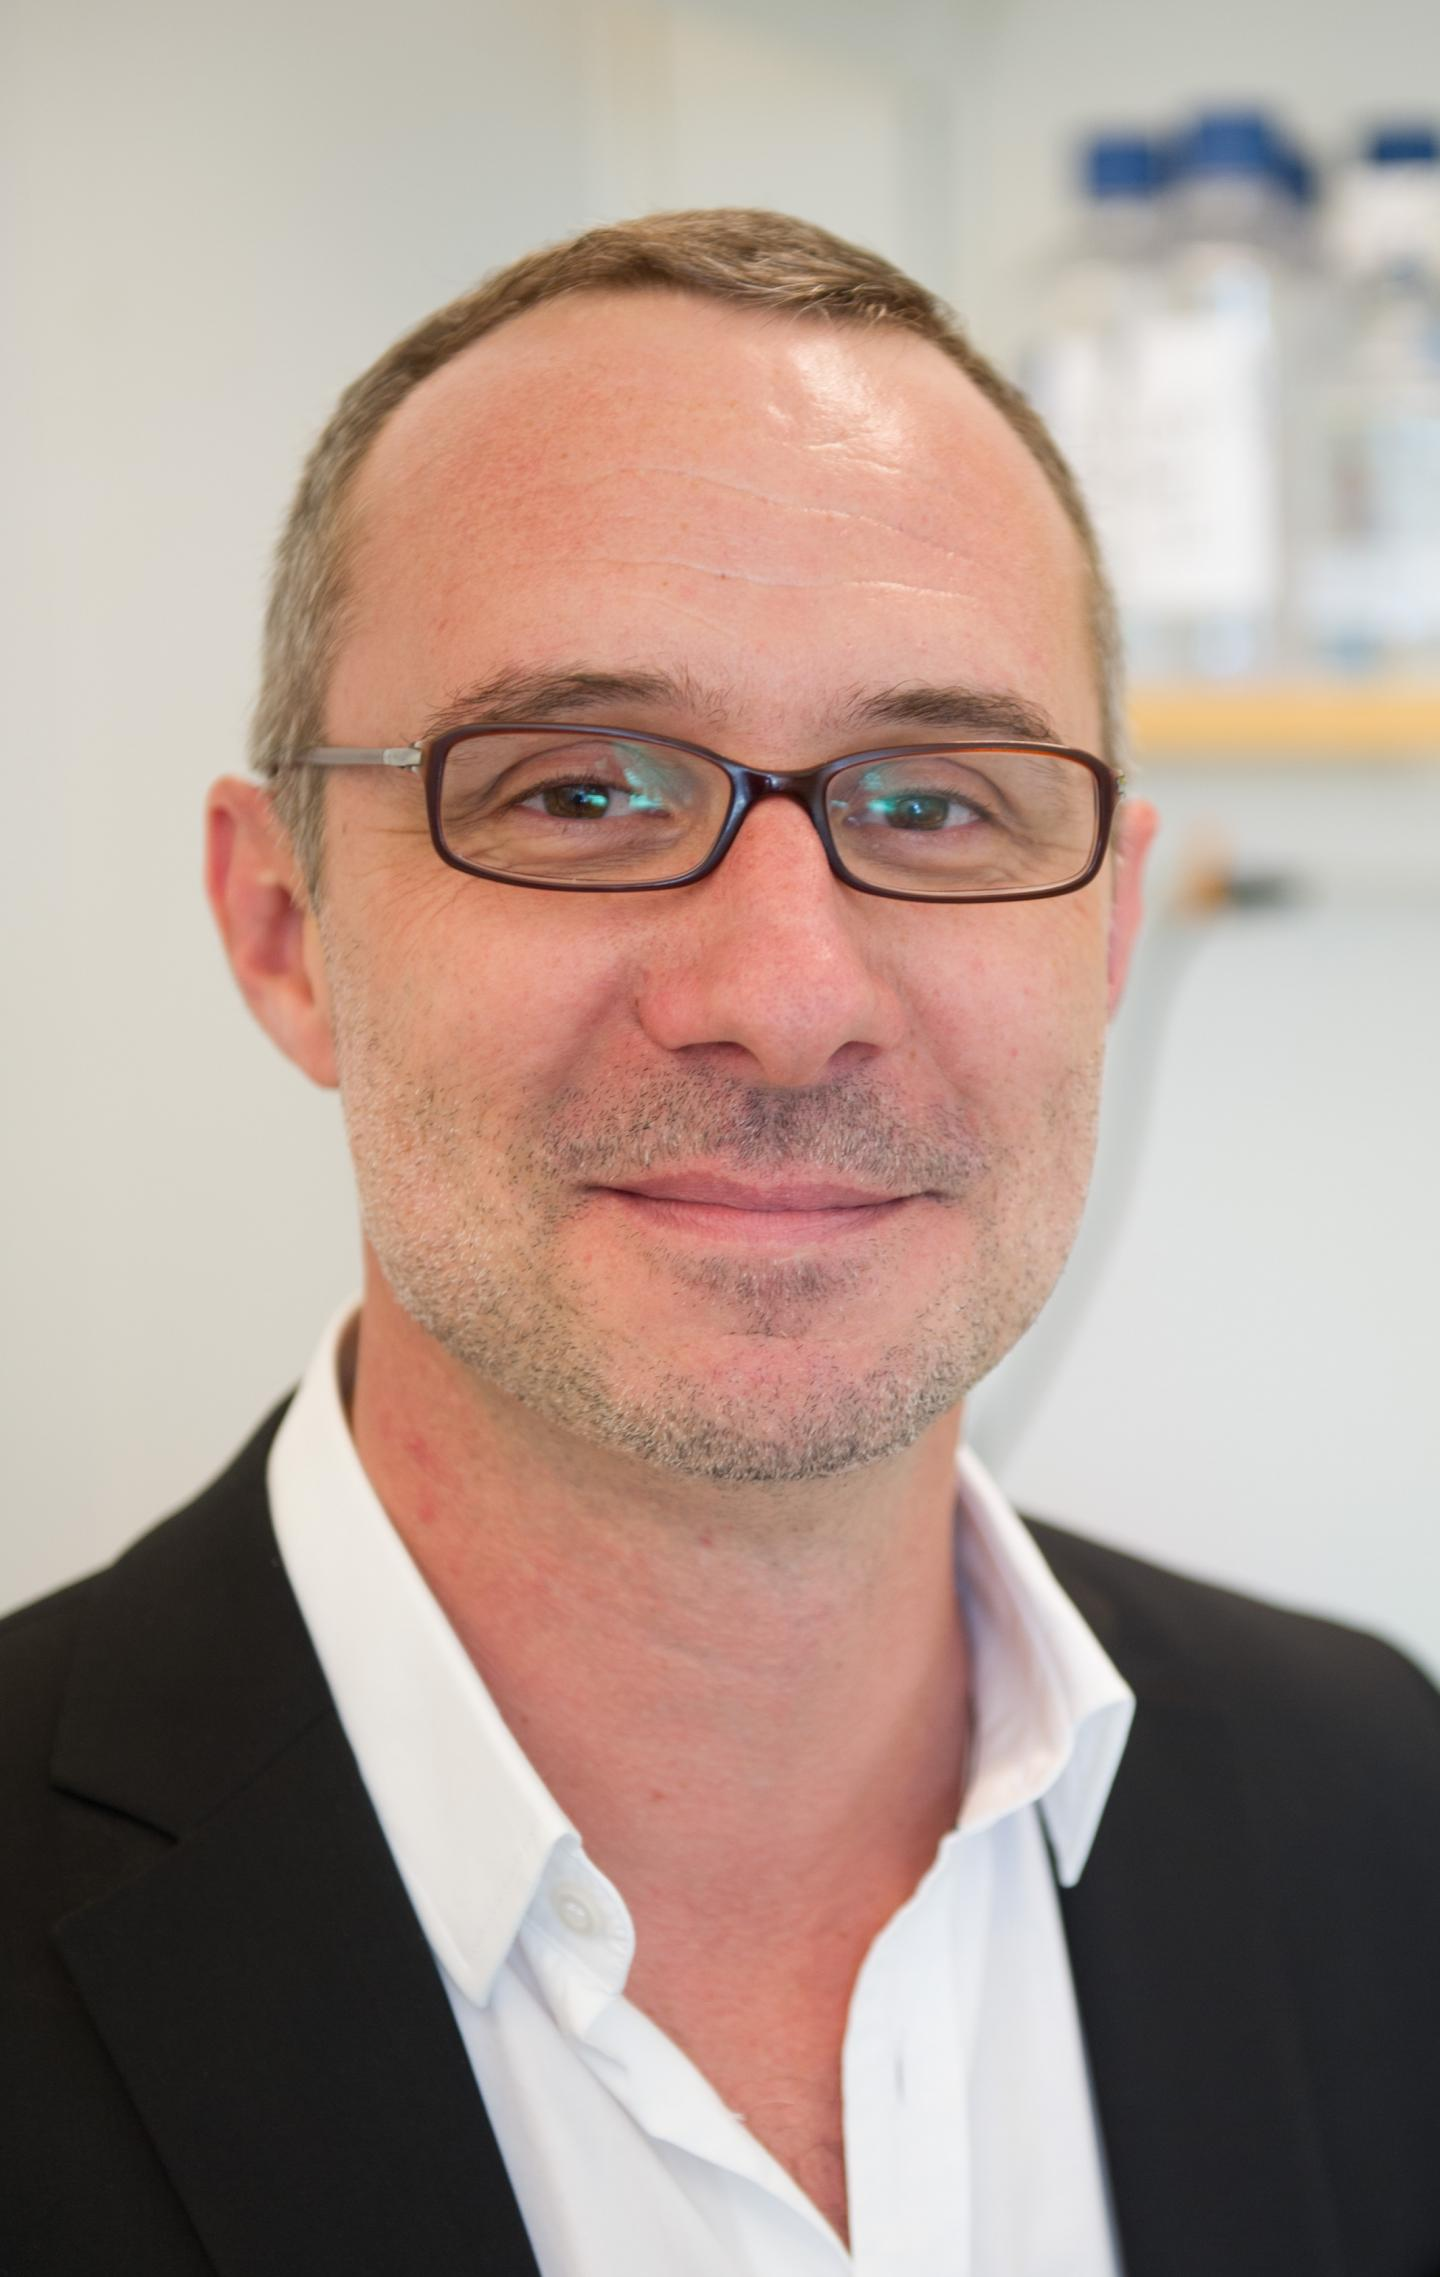 Jorge Ruas, Karolinska Institutet